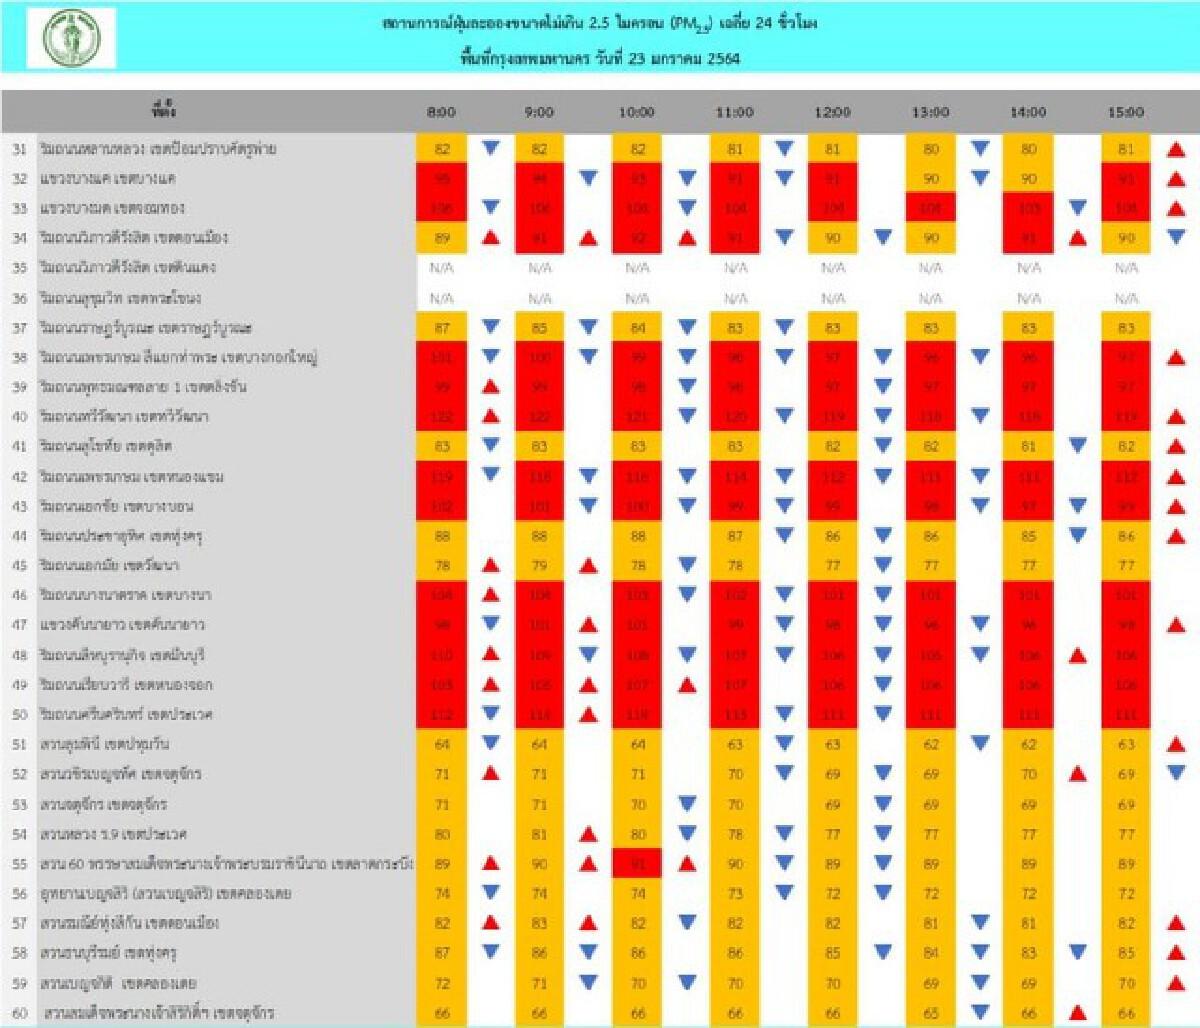 PM 2.5 พื้นที่ กทม. เช้านี้ เกินค่ามาตรฐาน 48 พื้นที่